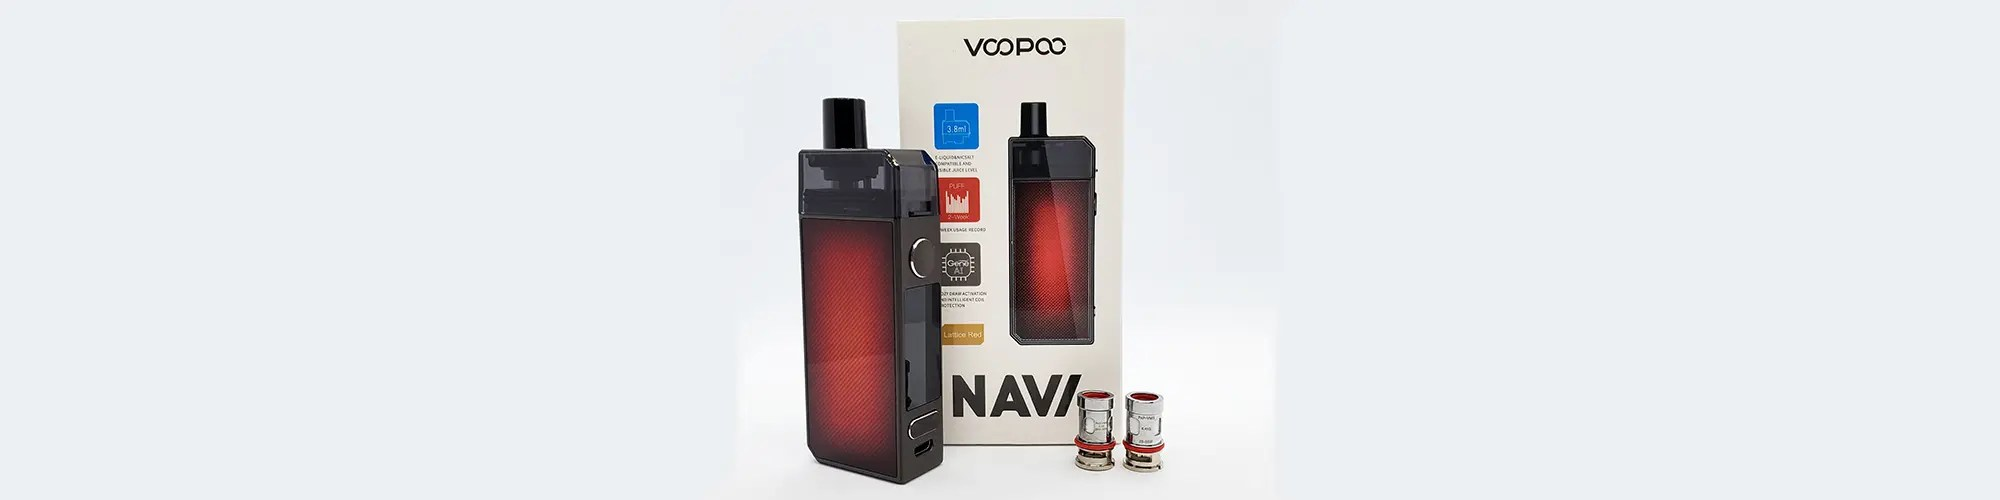 Voopoo Navi Review